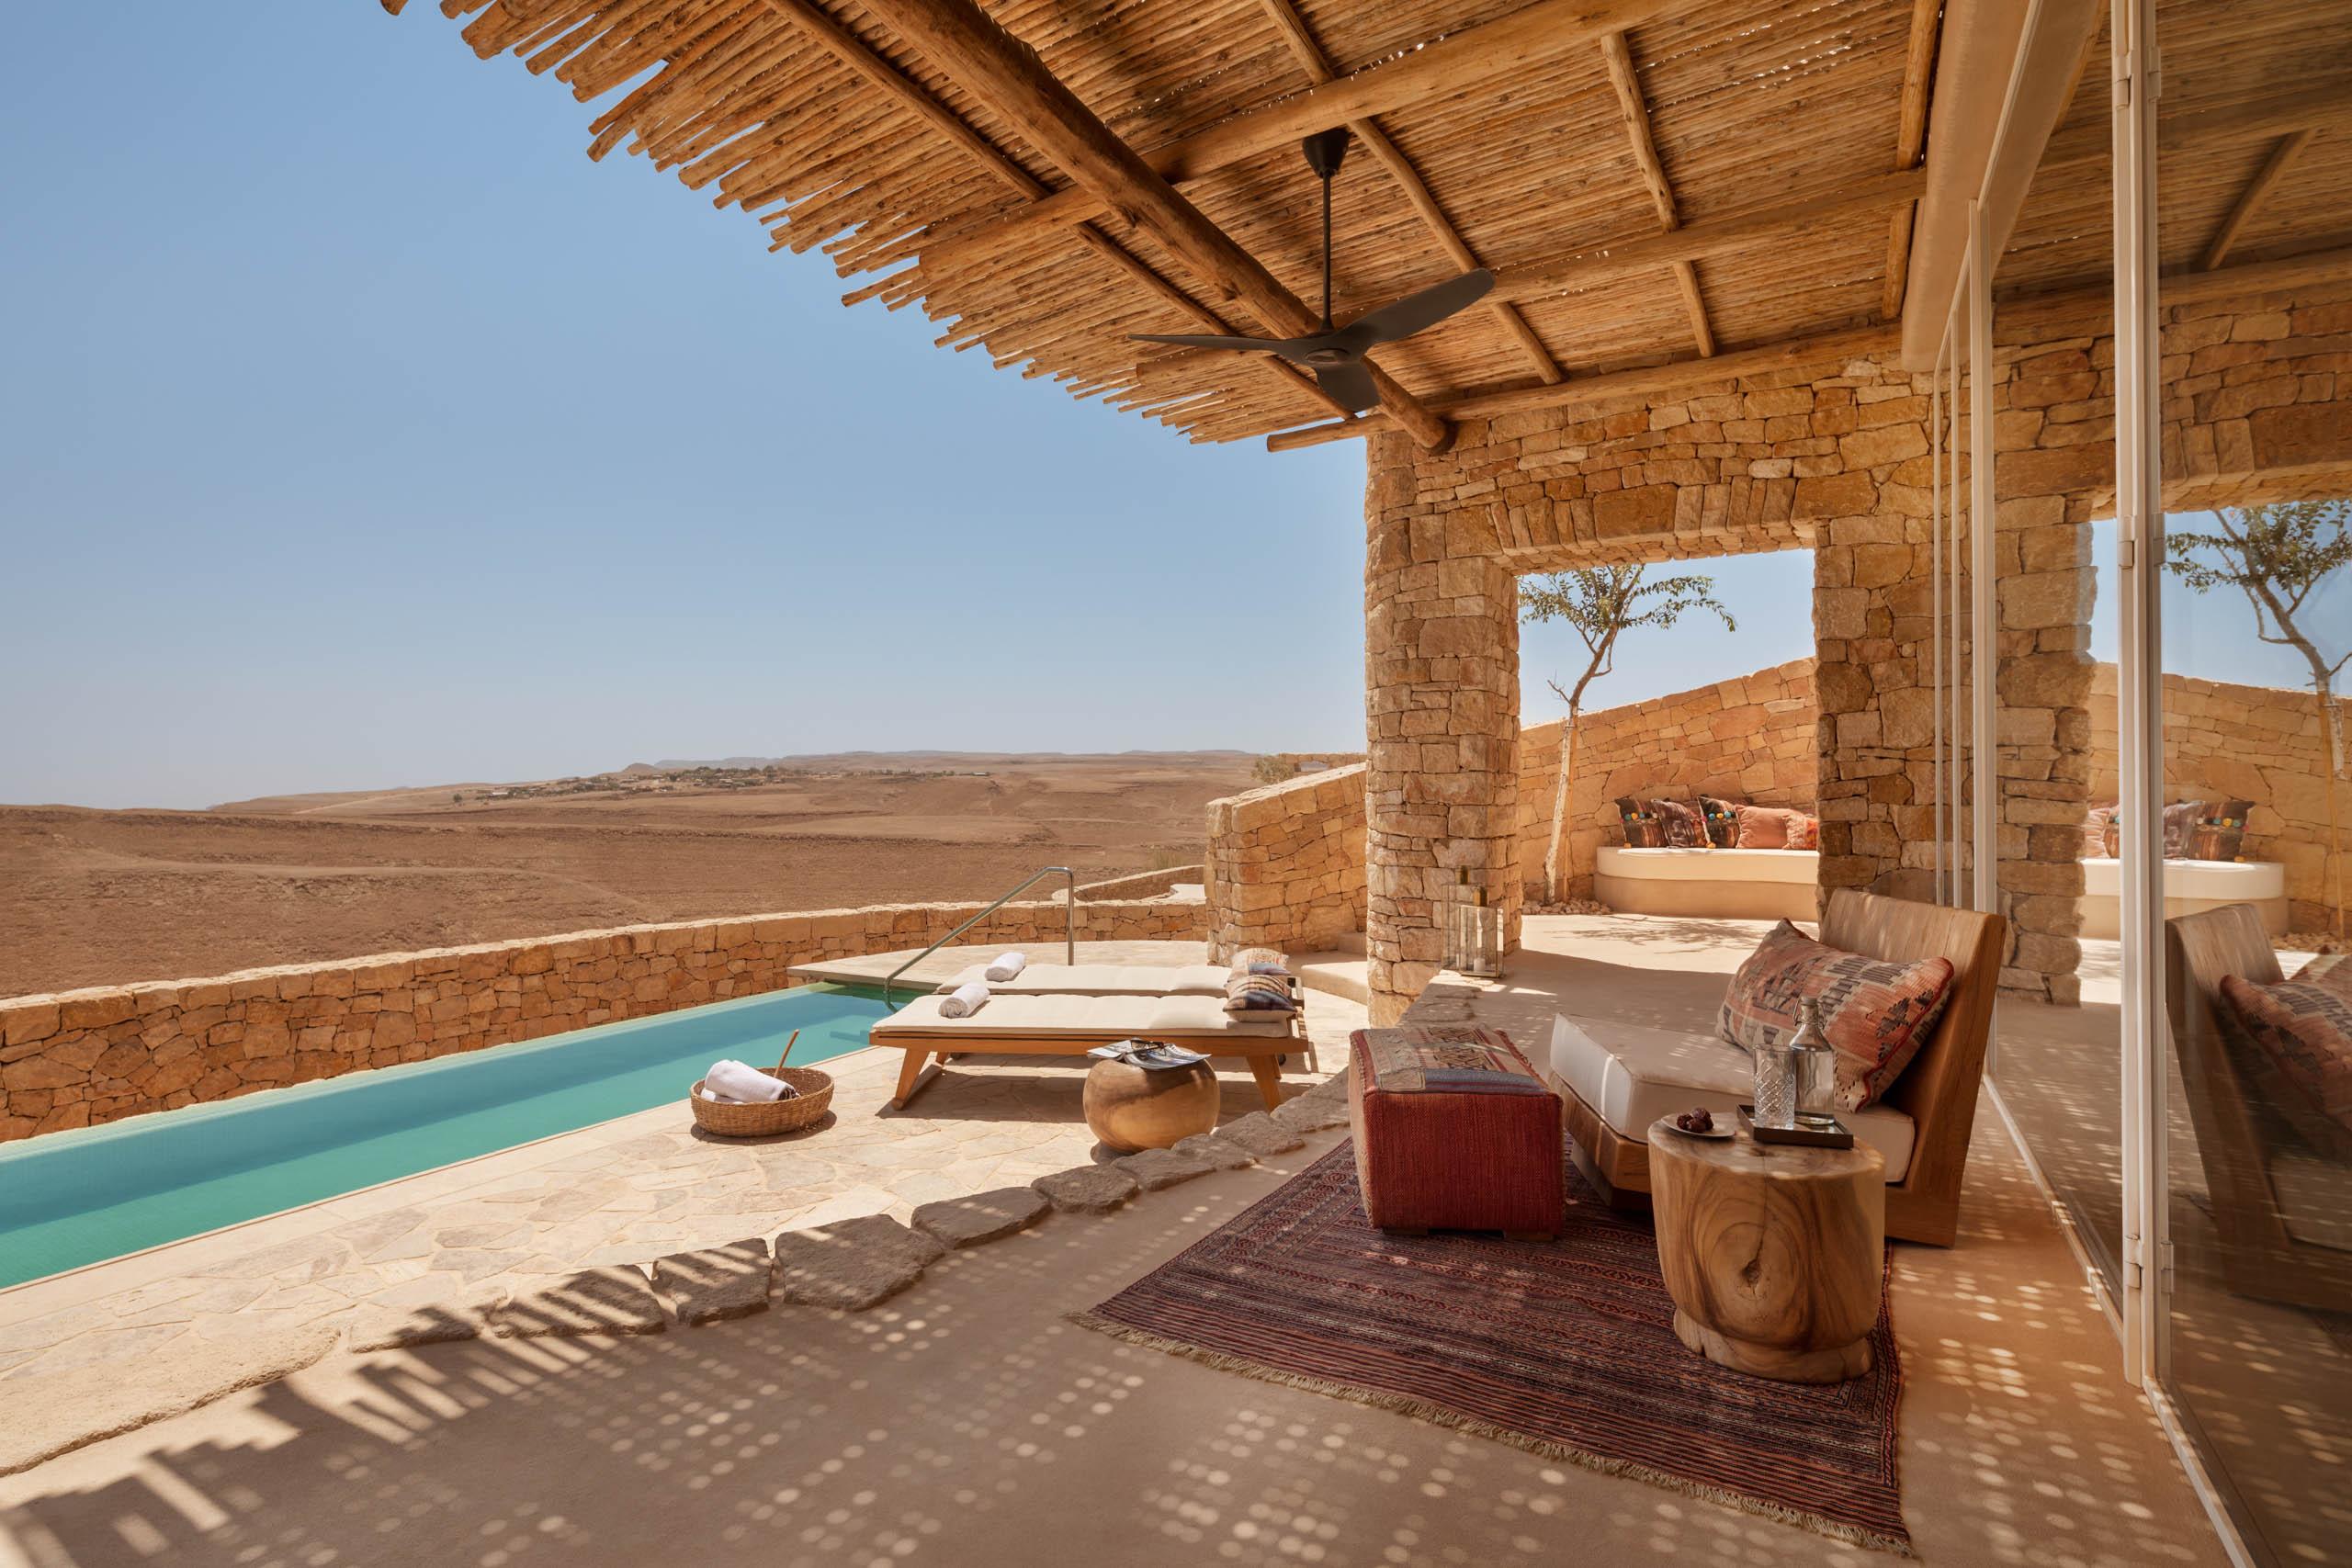 shaharut-israelpanorama-pool-villa-outdoor-terrace2.jpg